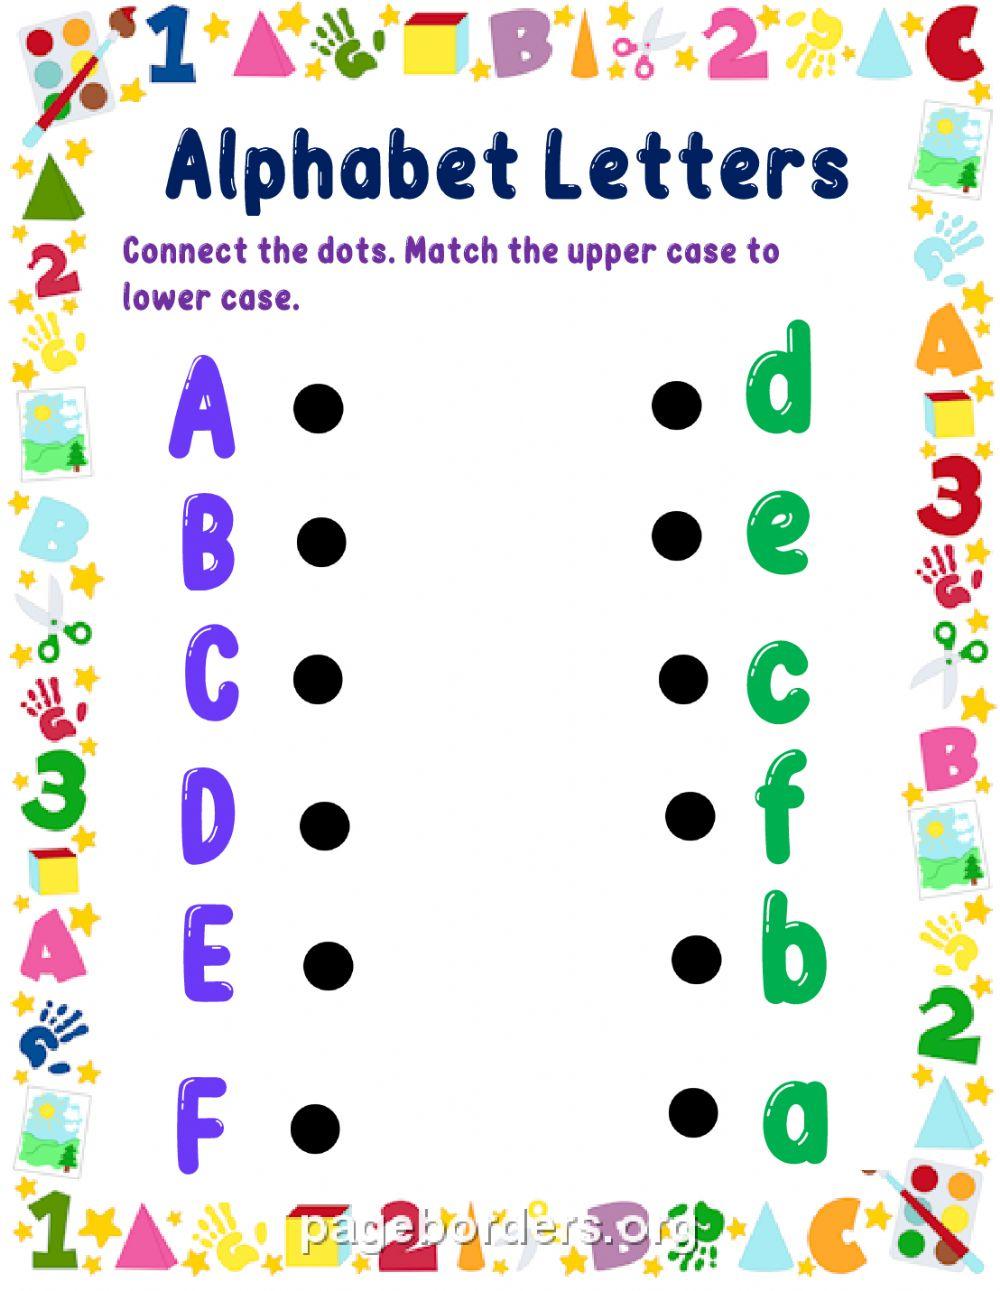 Alphabet Letters - Interactive Worksheet throughout Alphabet Reading Worksheets